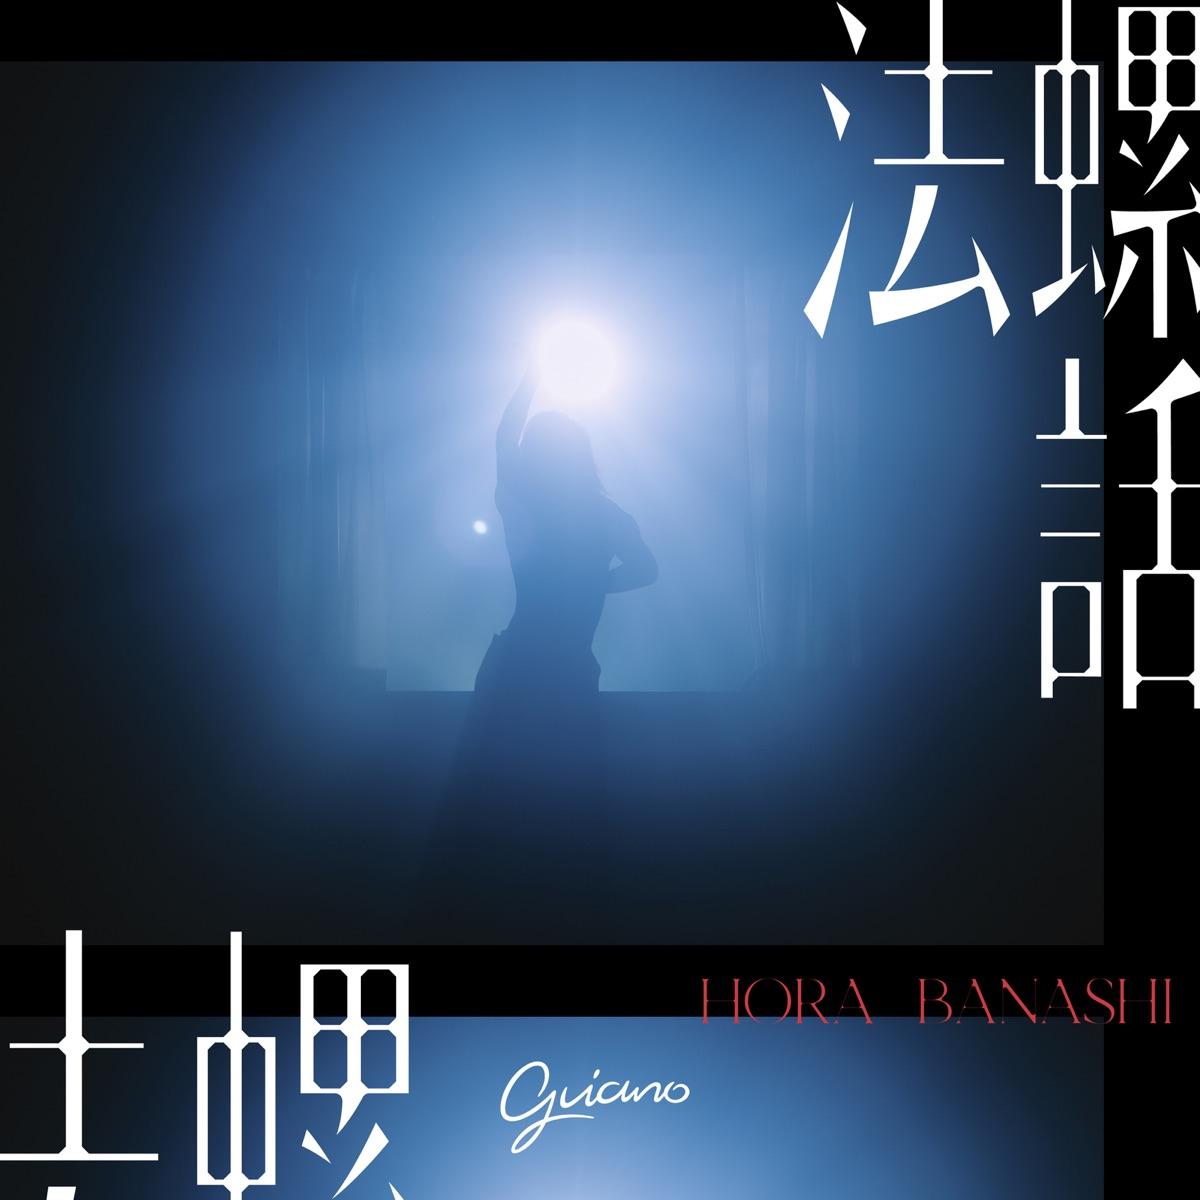 『Guiano - 法螺話 (self cover) 歌詞』収録の『法螺話 (self cover)』ジャケット